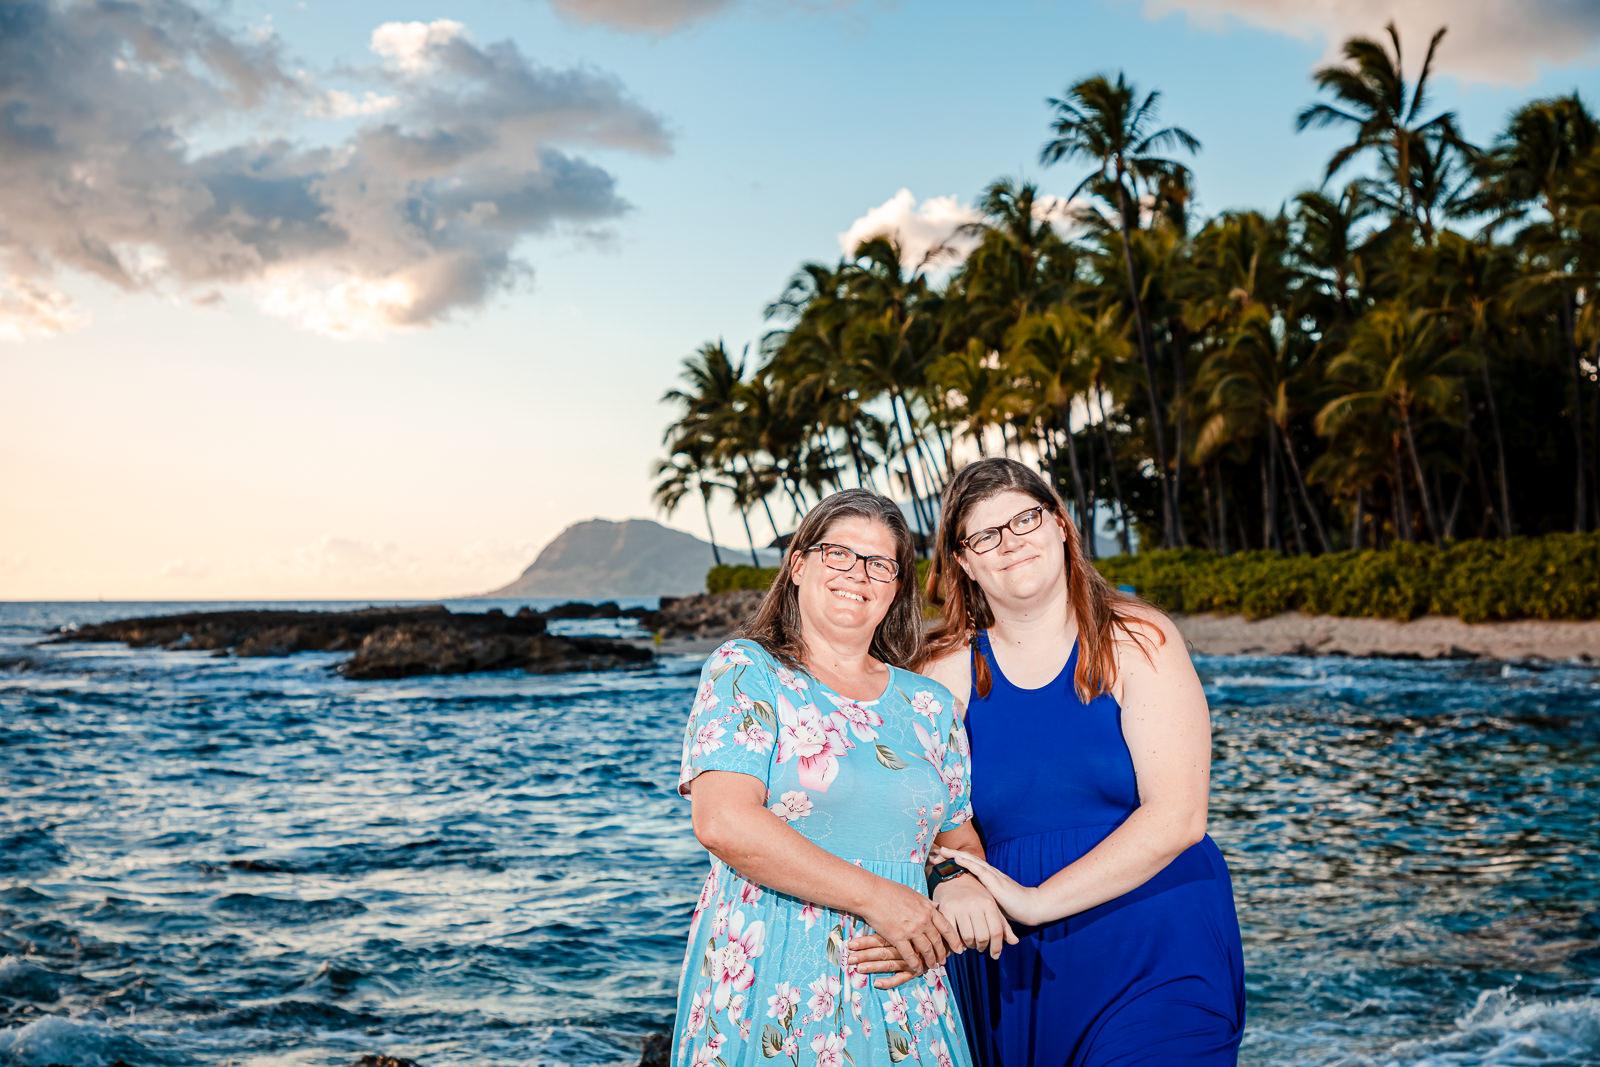 Oahu2019-9389.jpg